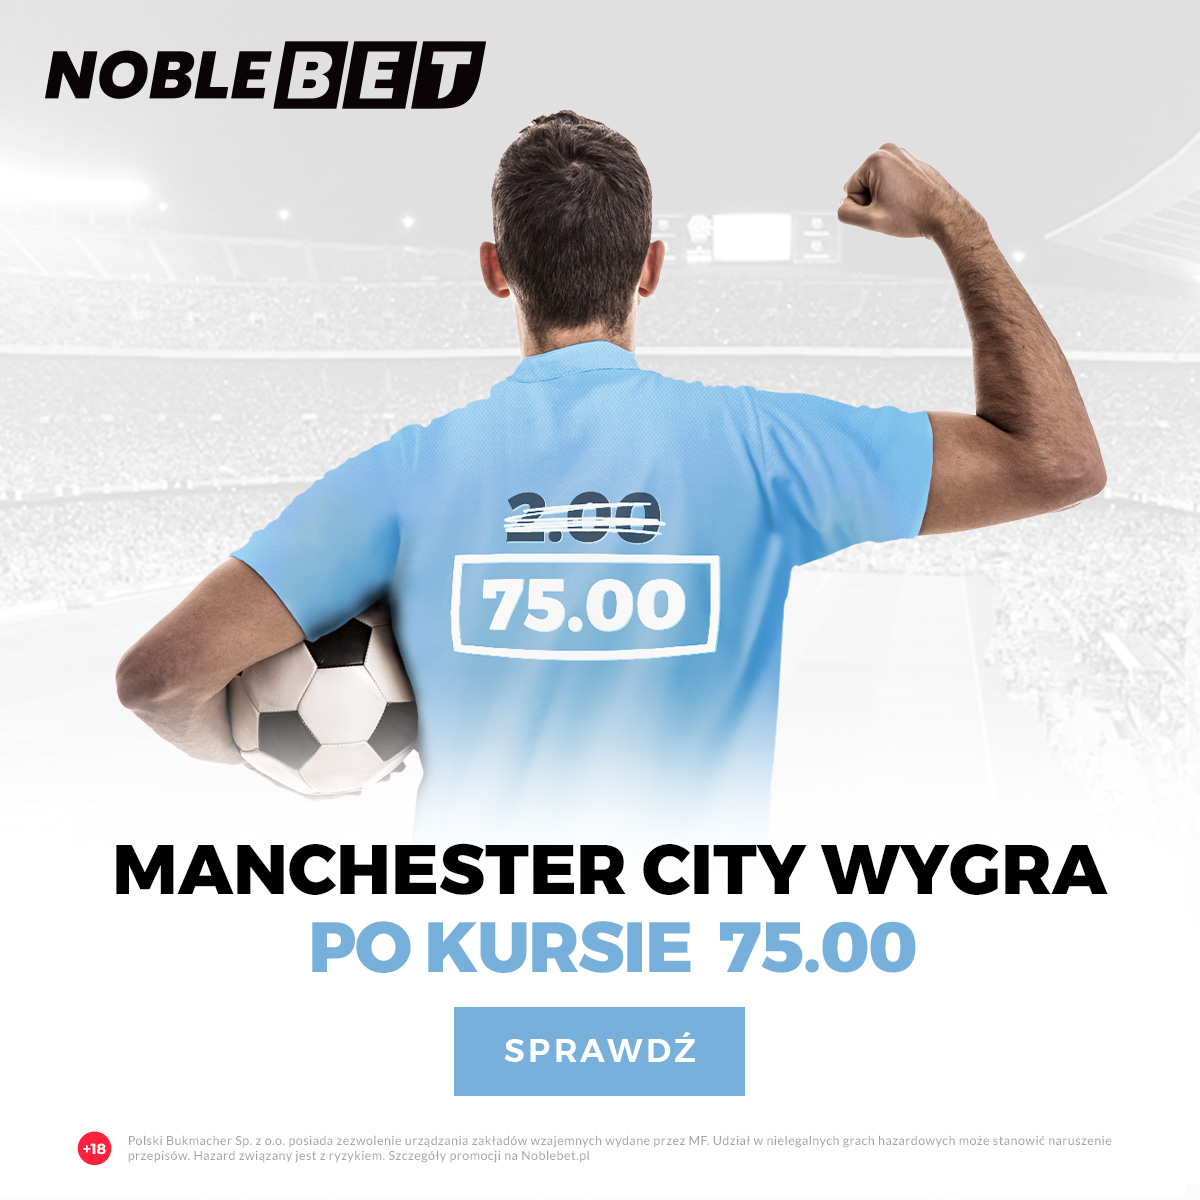 Manchester City wygra LM po kursie 75.00 !